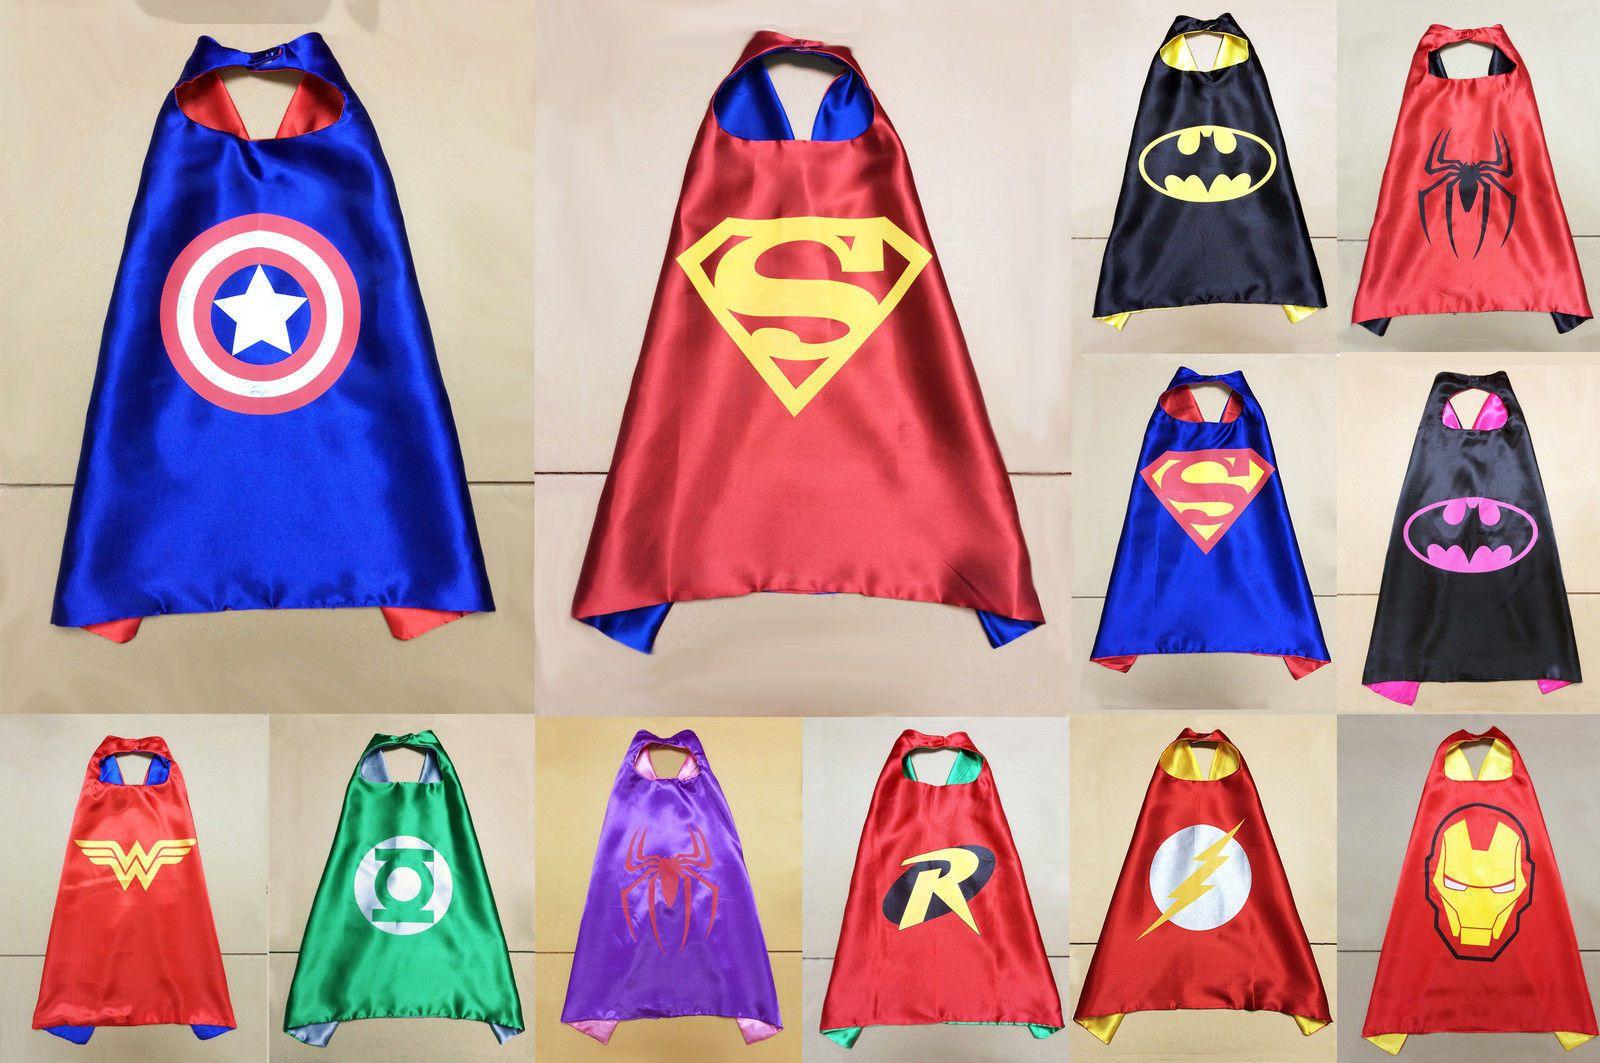 new print logo custom superhero cape boys costume superhero fancy rh dhgate com Superhero Costumes for Men Female Superhero Costumes